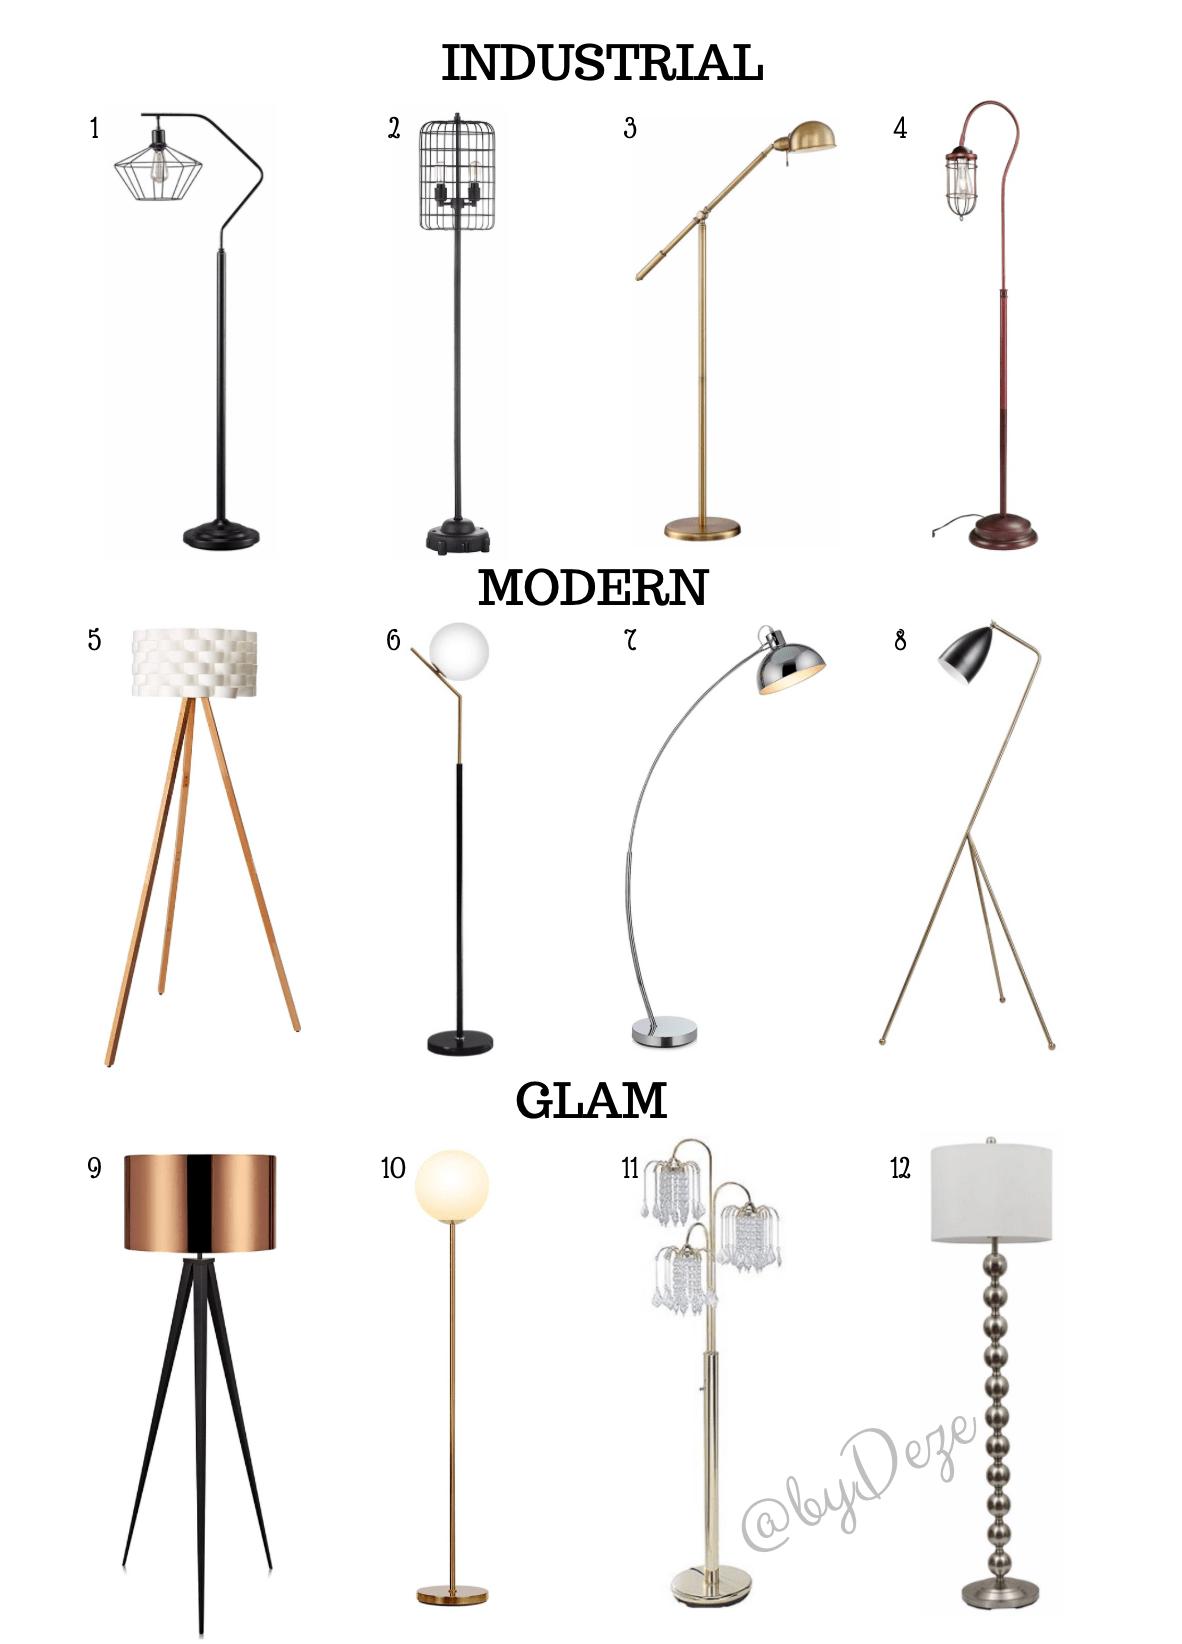 Cheap Floor Lamps All Under 75 Bydeze Floor Lamps Living Room Stylish Floor Lamp Cheap Floor Lamps